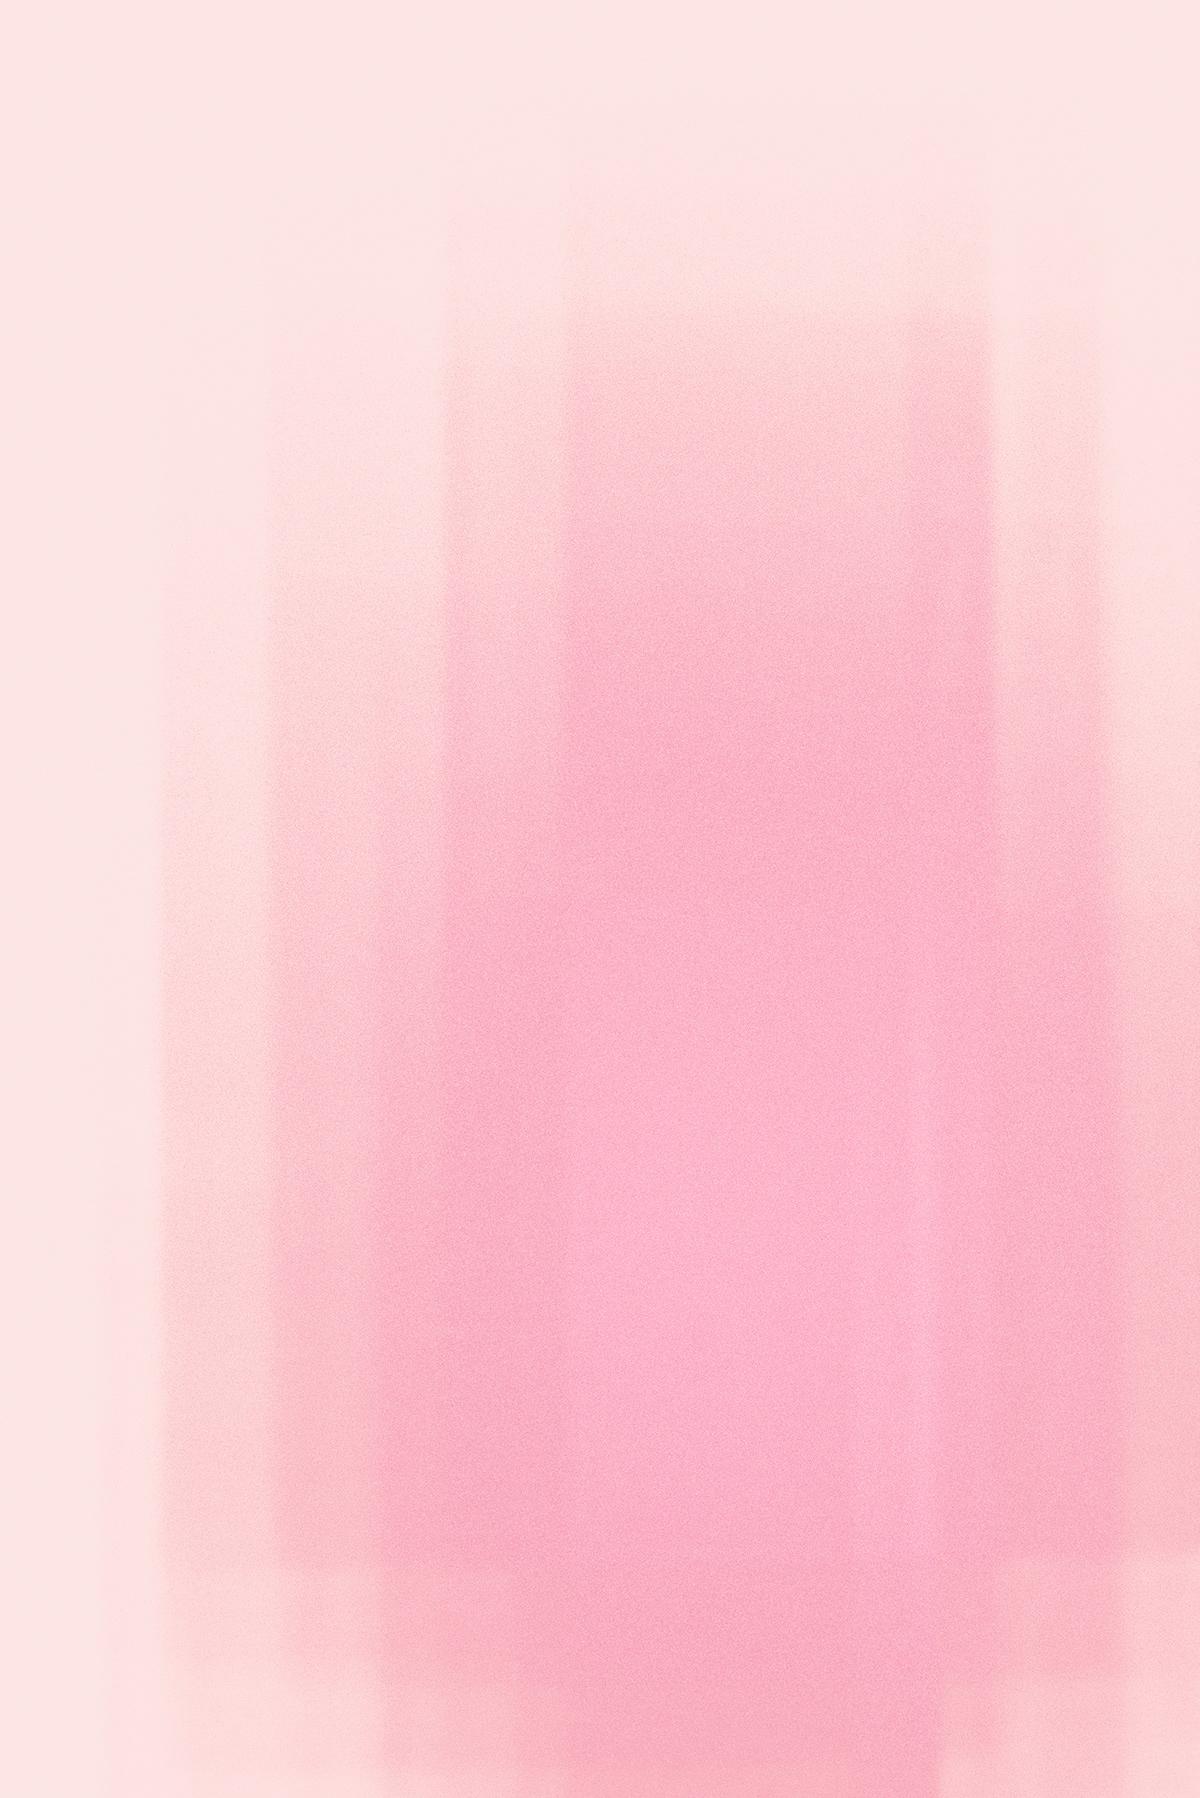 Image may contain: abstract and wall